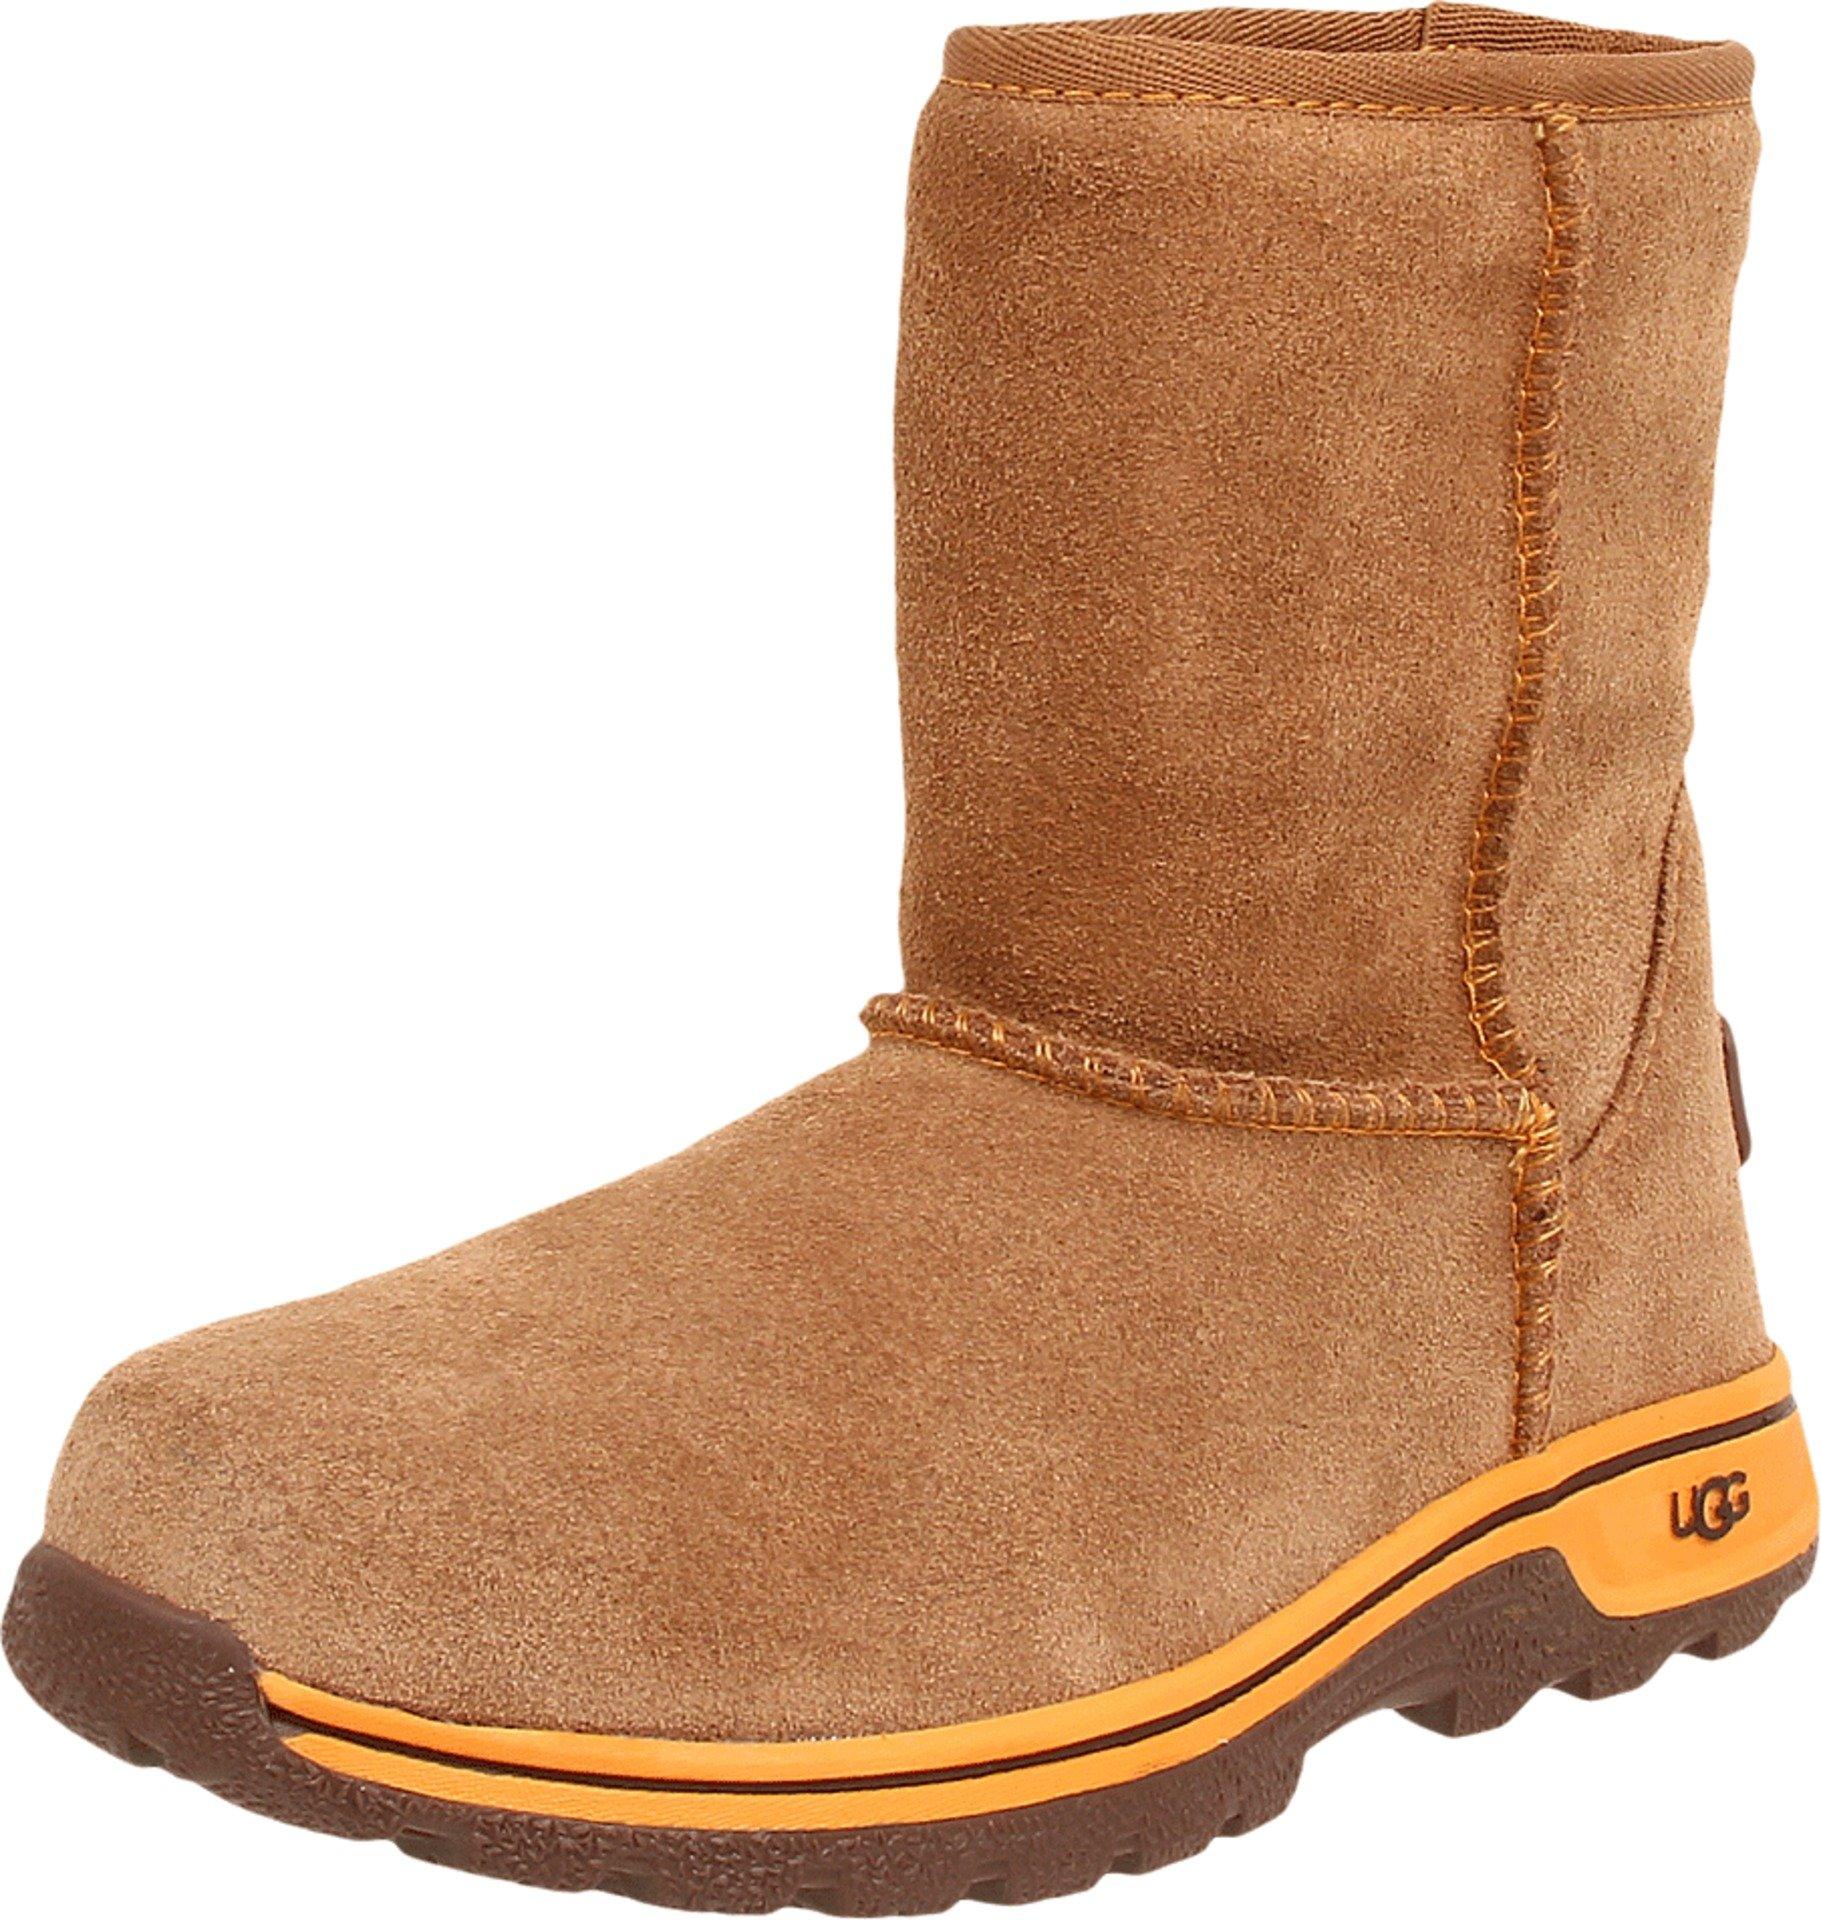 UGG Australia Girls Lynden Boot Size 2 Little Kid